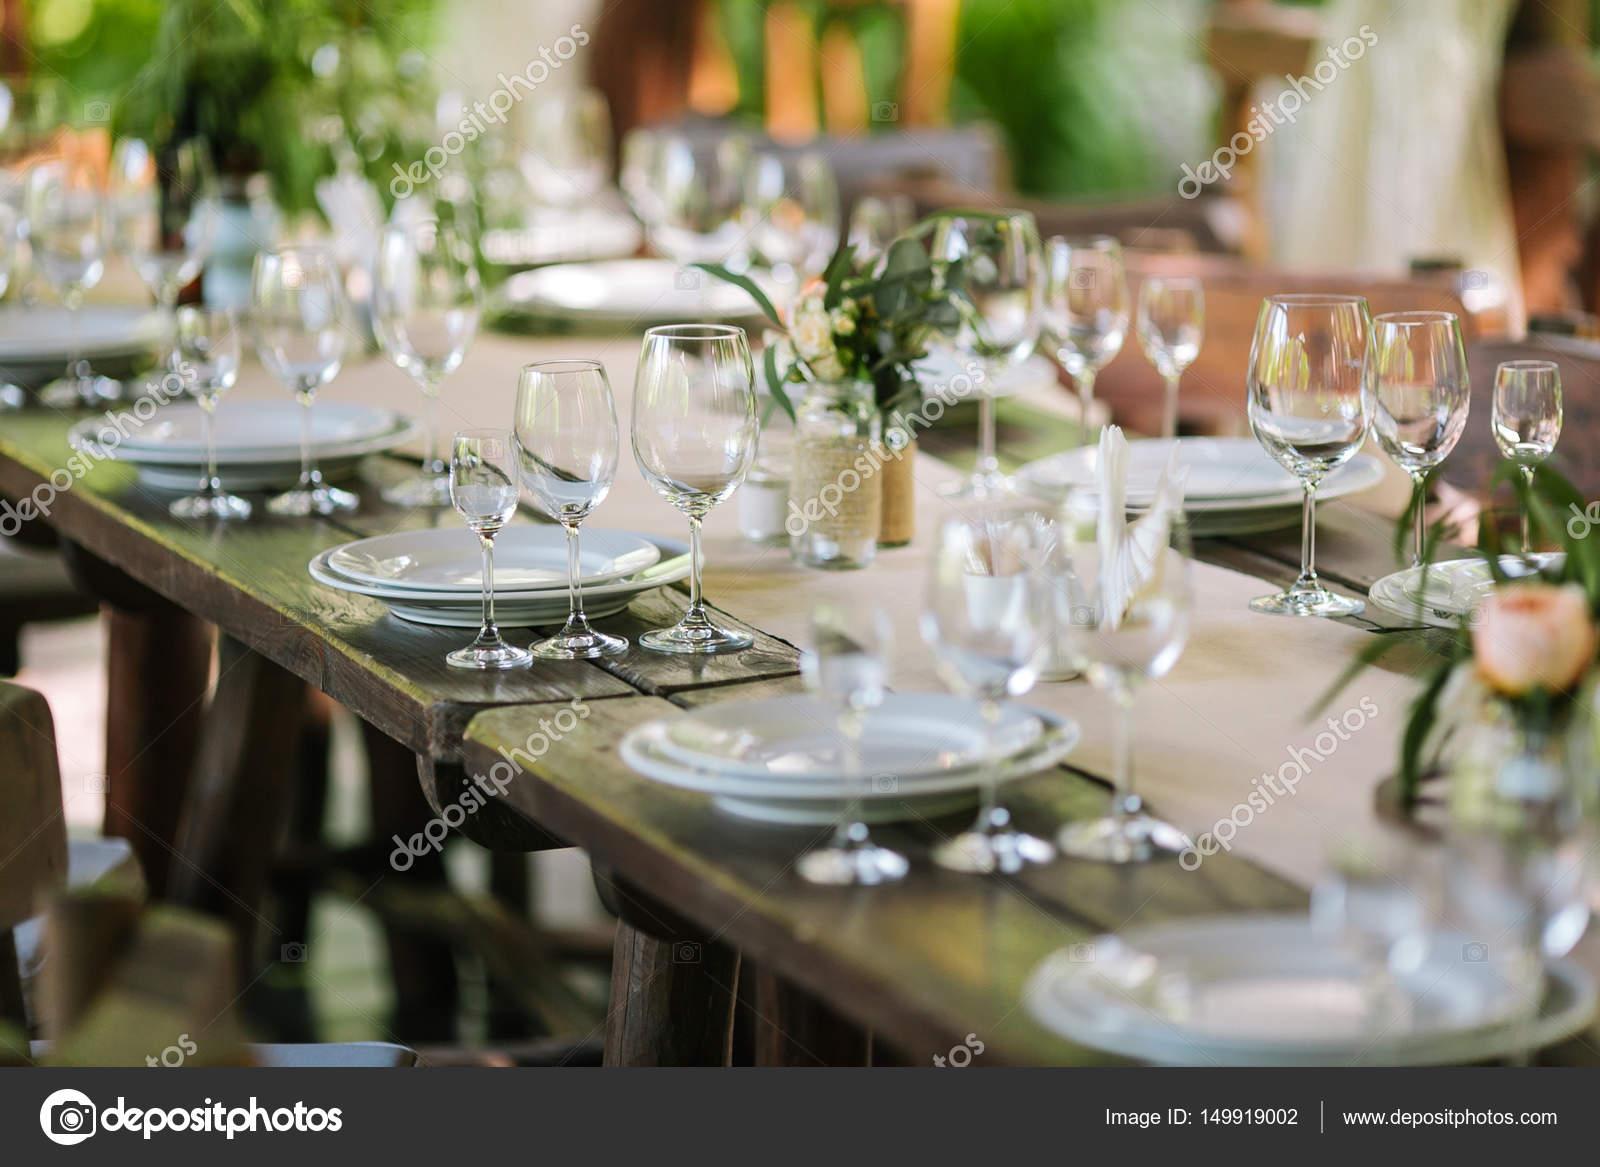 Glasses on the festive table setting. Wedding table decor. Table ...